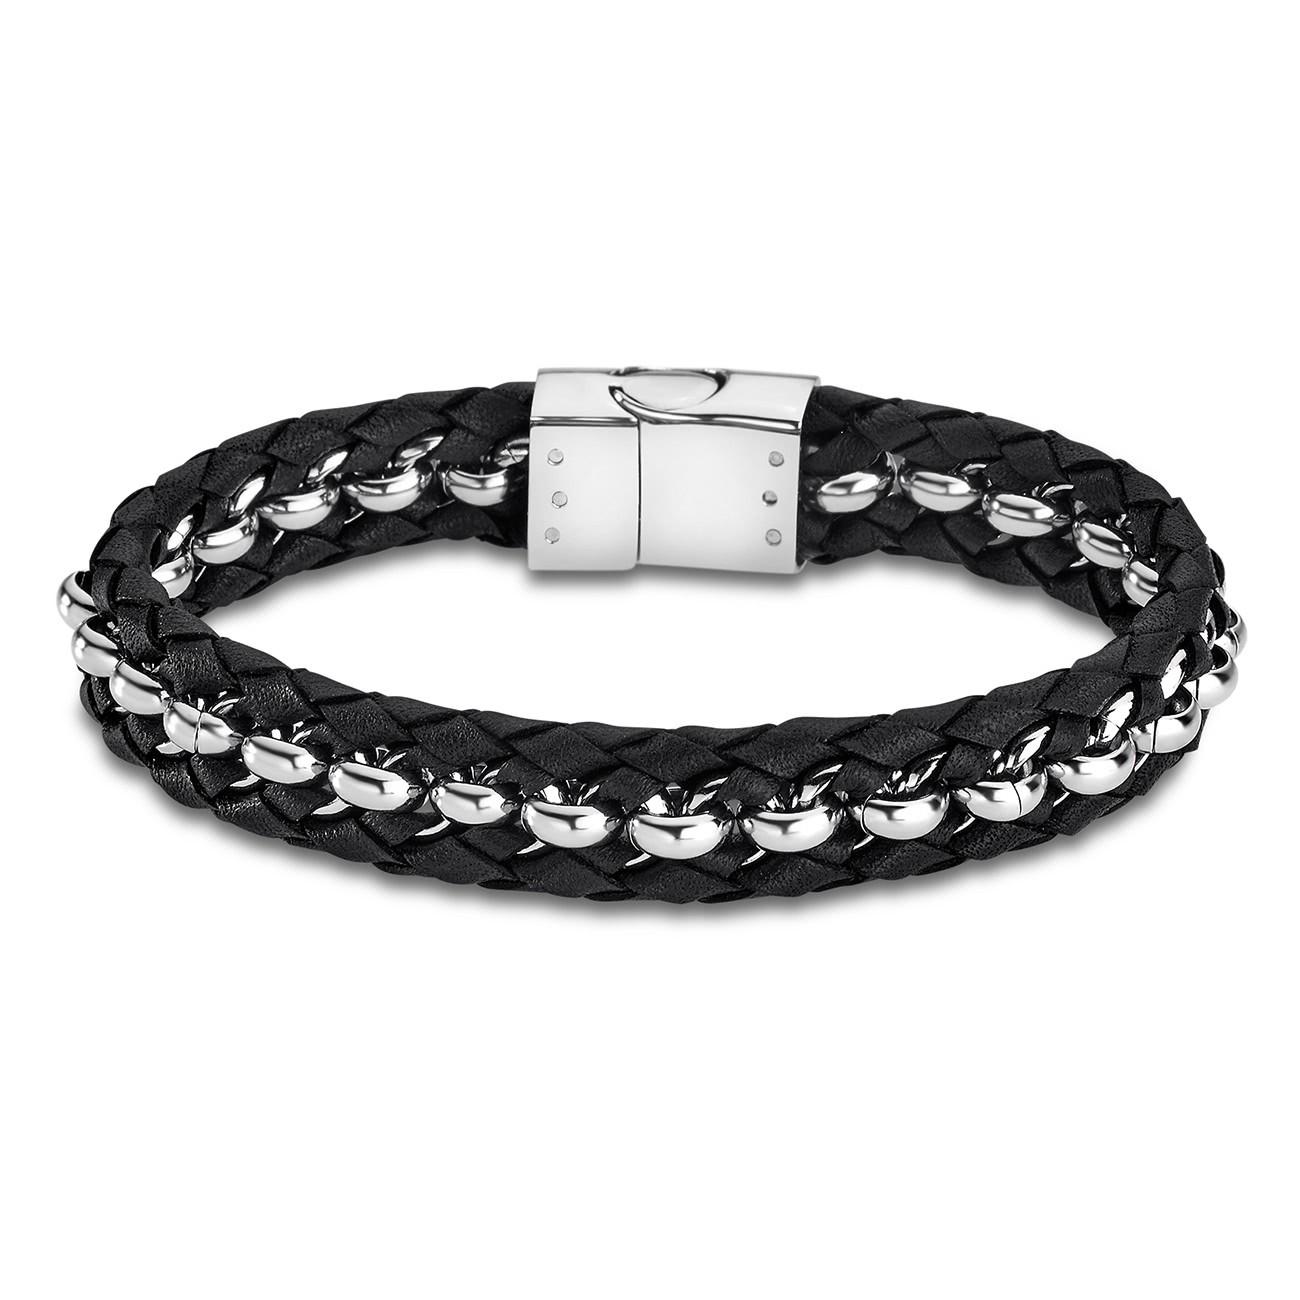 LOTUS Style Armband Herren LS1810-2/3 Leder silber schwarz JLS1810-2-3